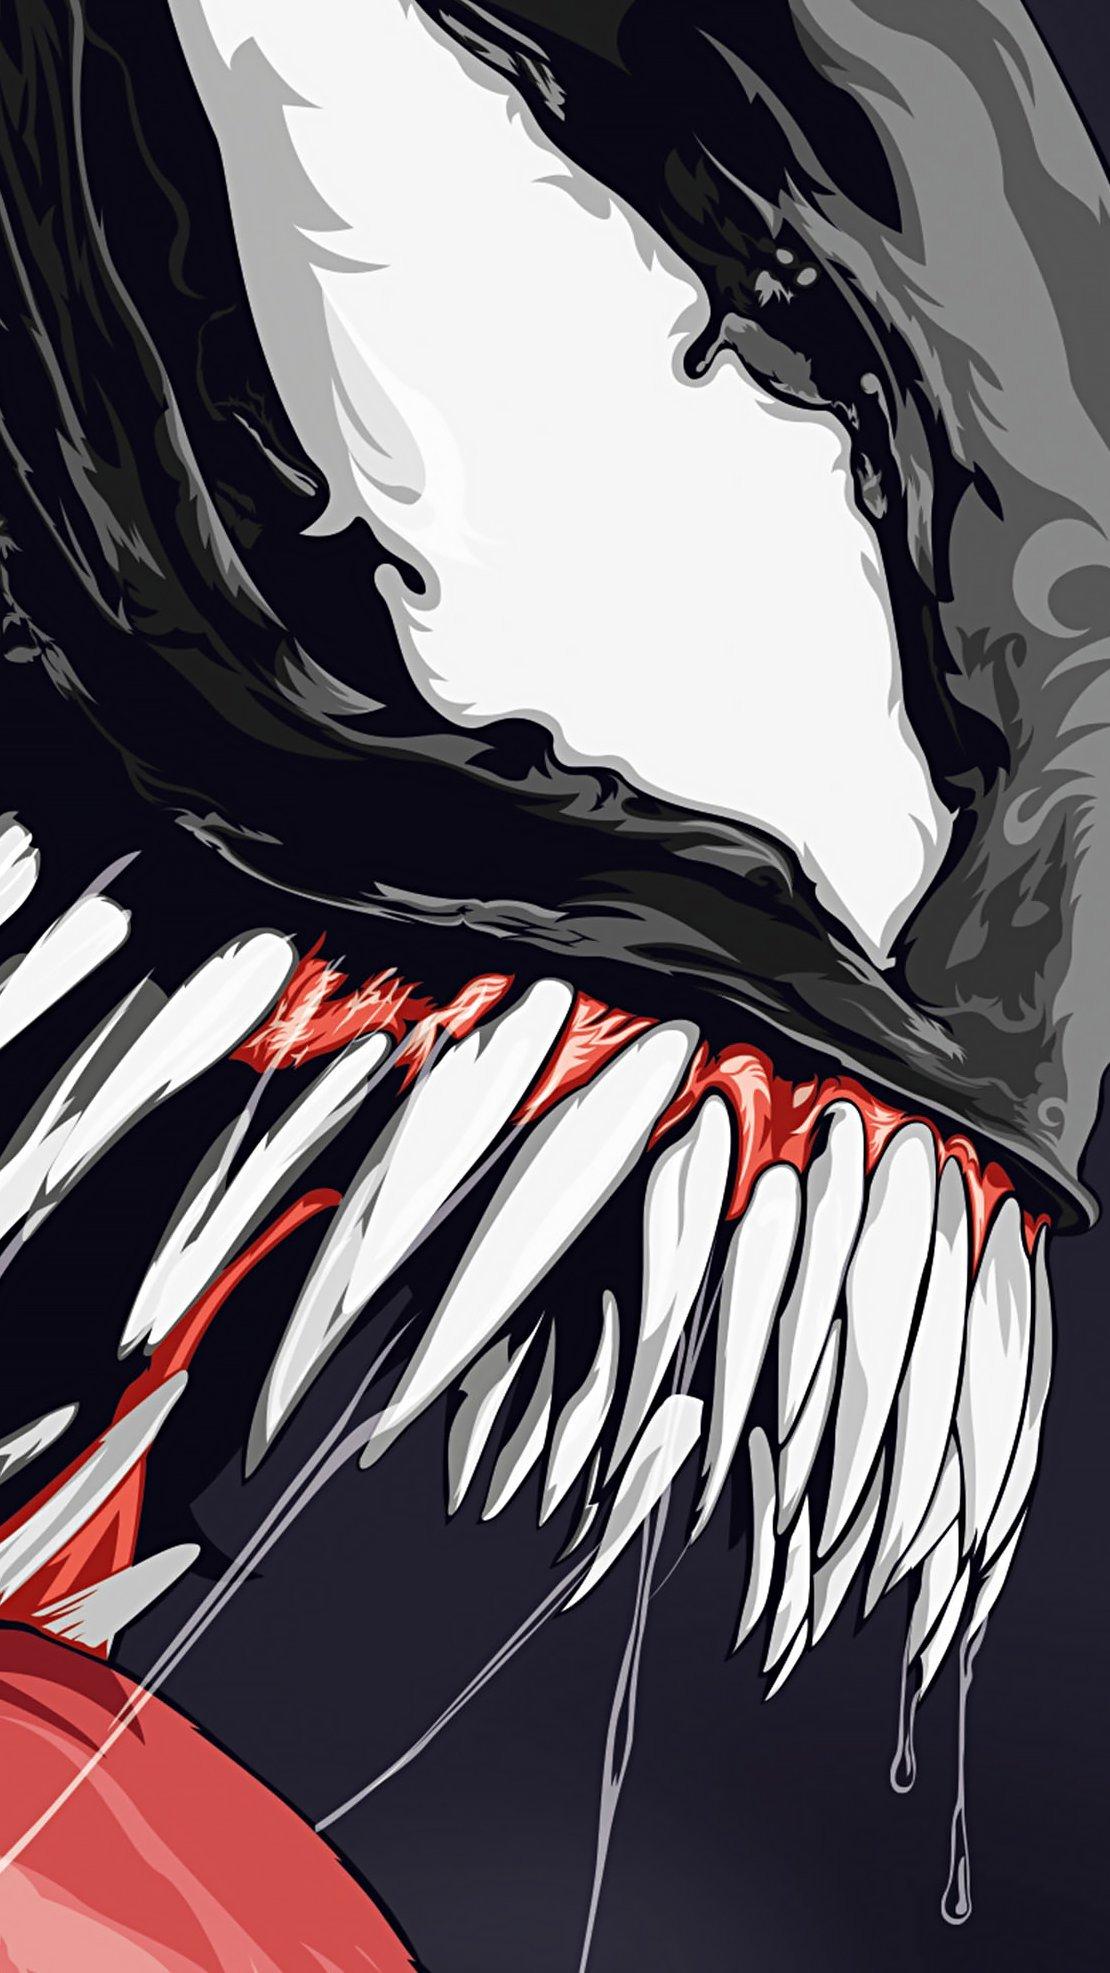 Wallpaper Venom illustration Artwork Vertical